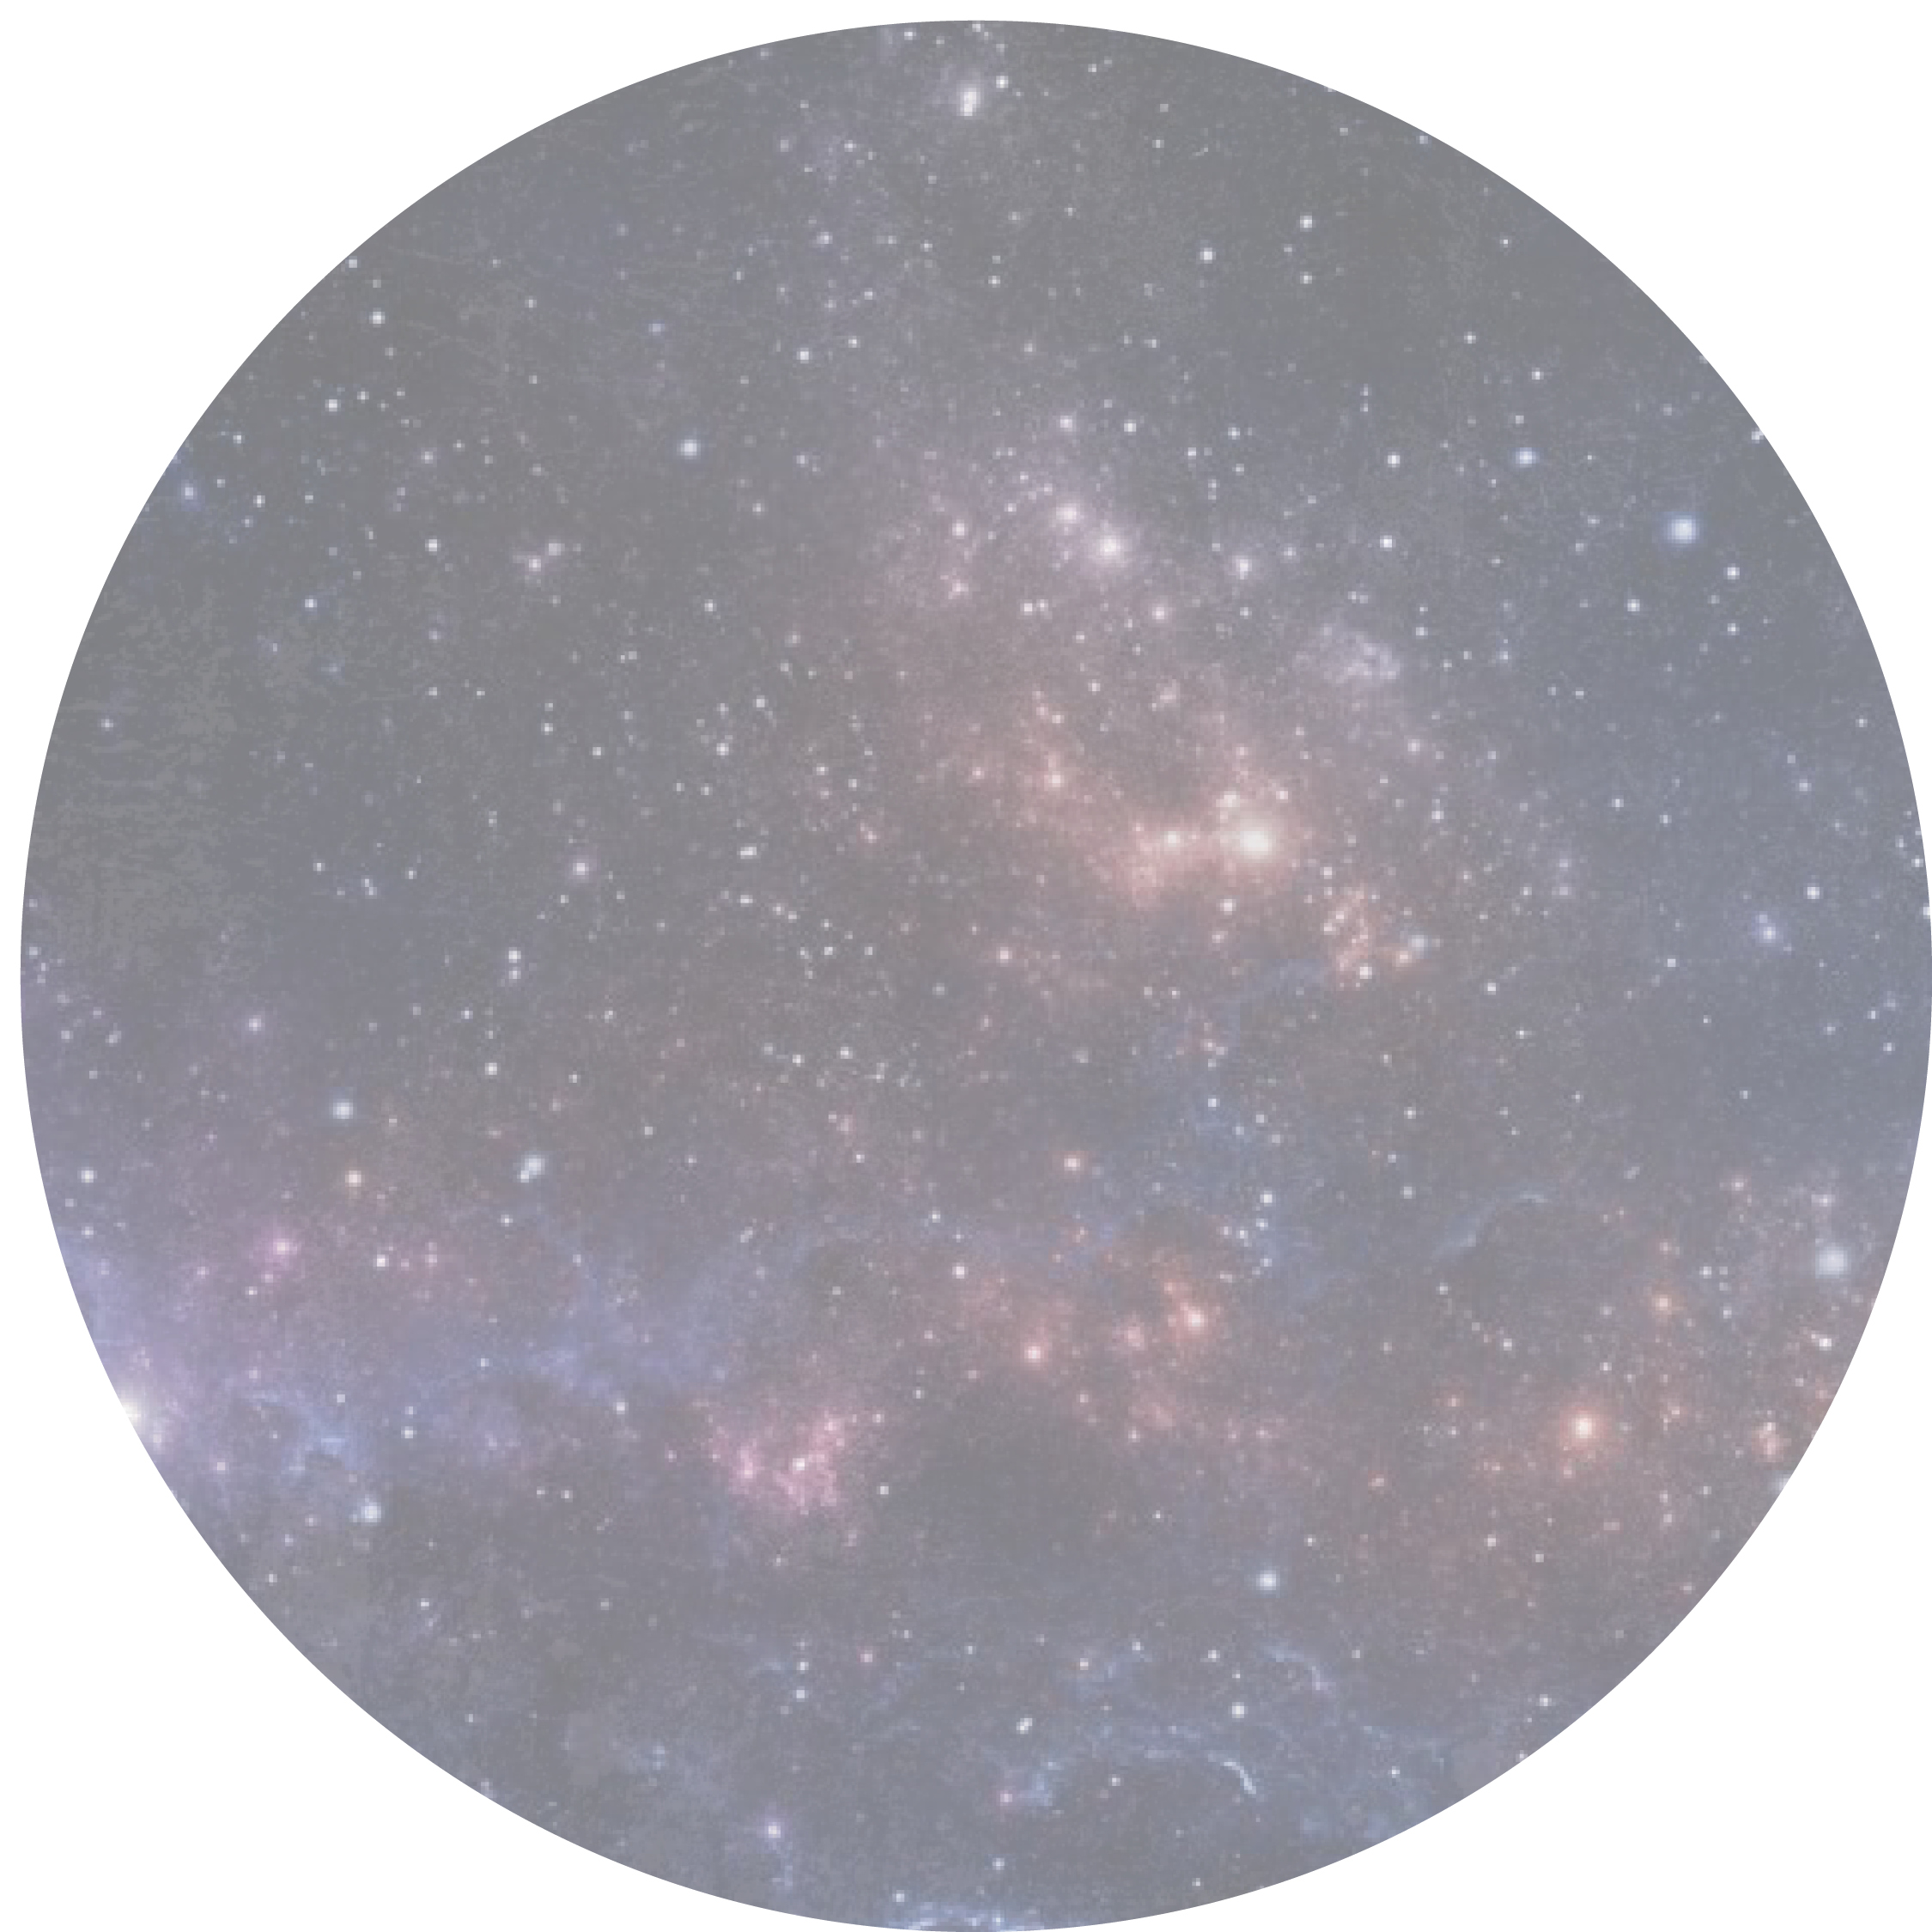 DOMKYRKAN - NORDIC WELLNESS